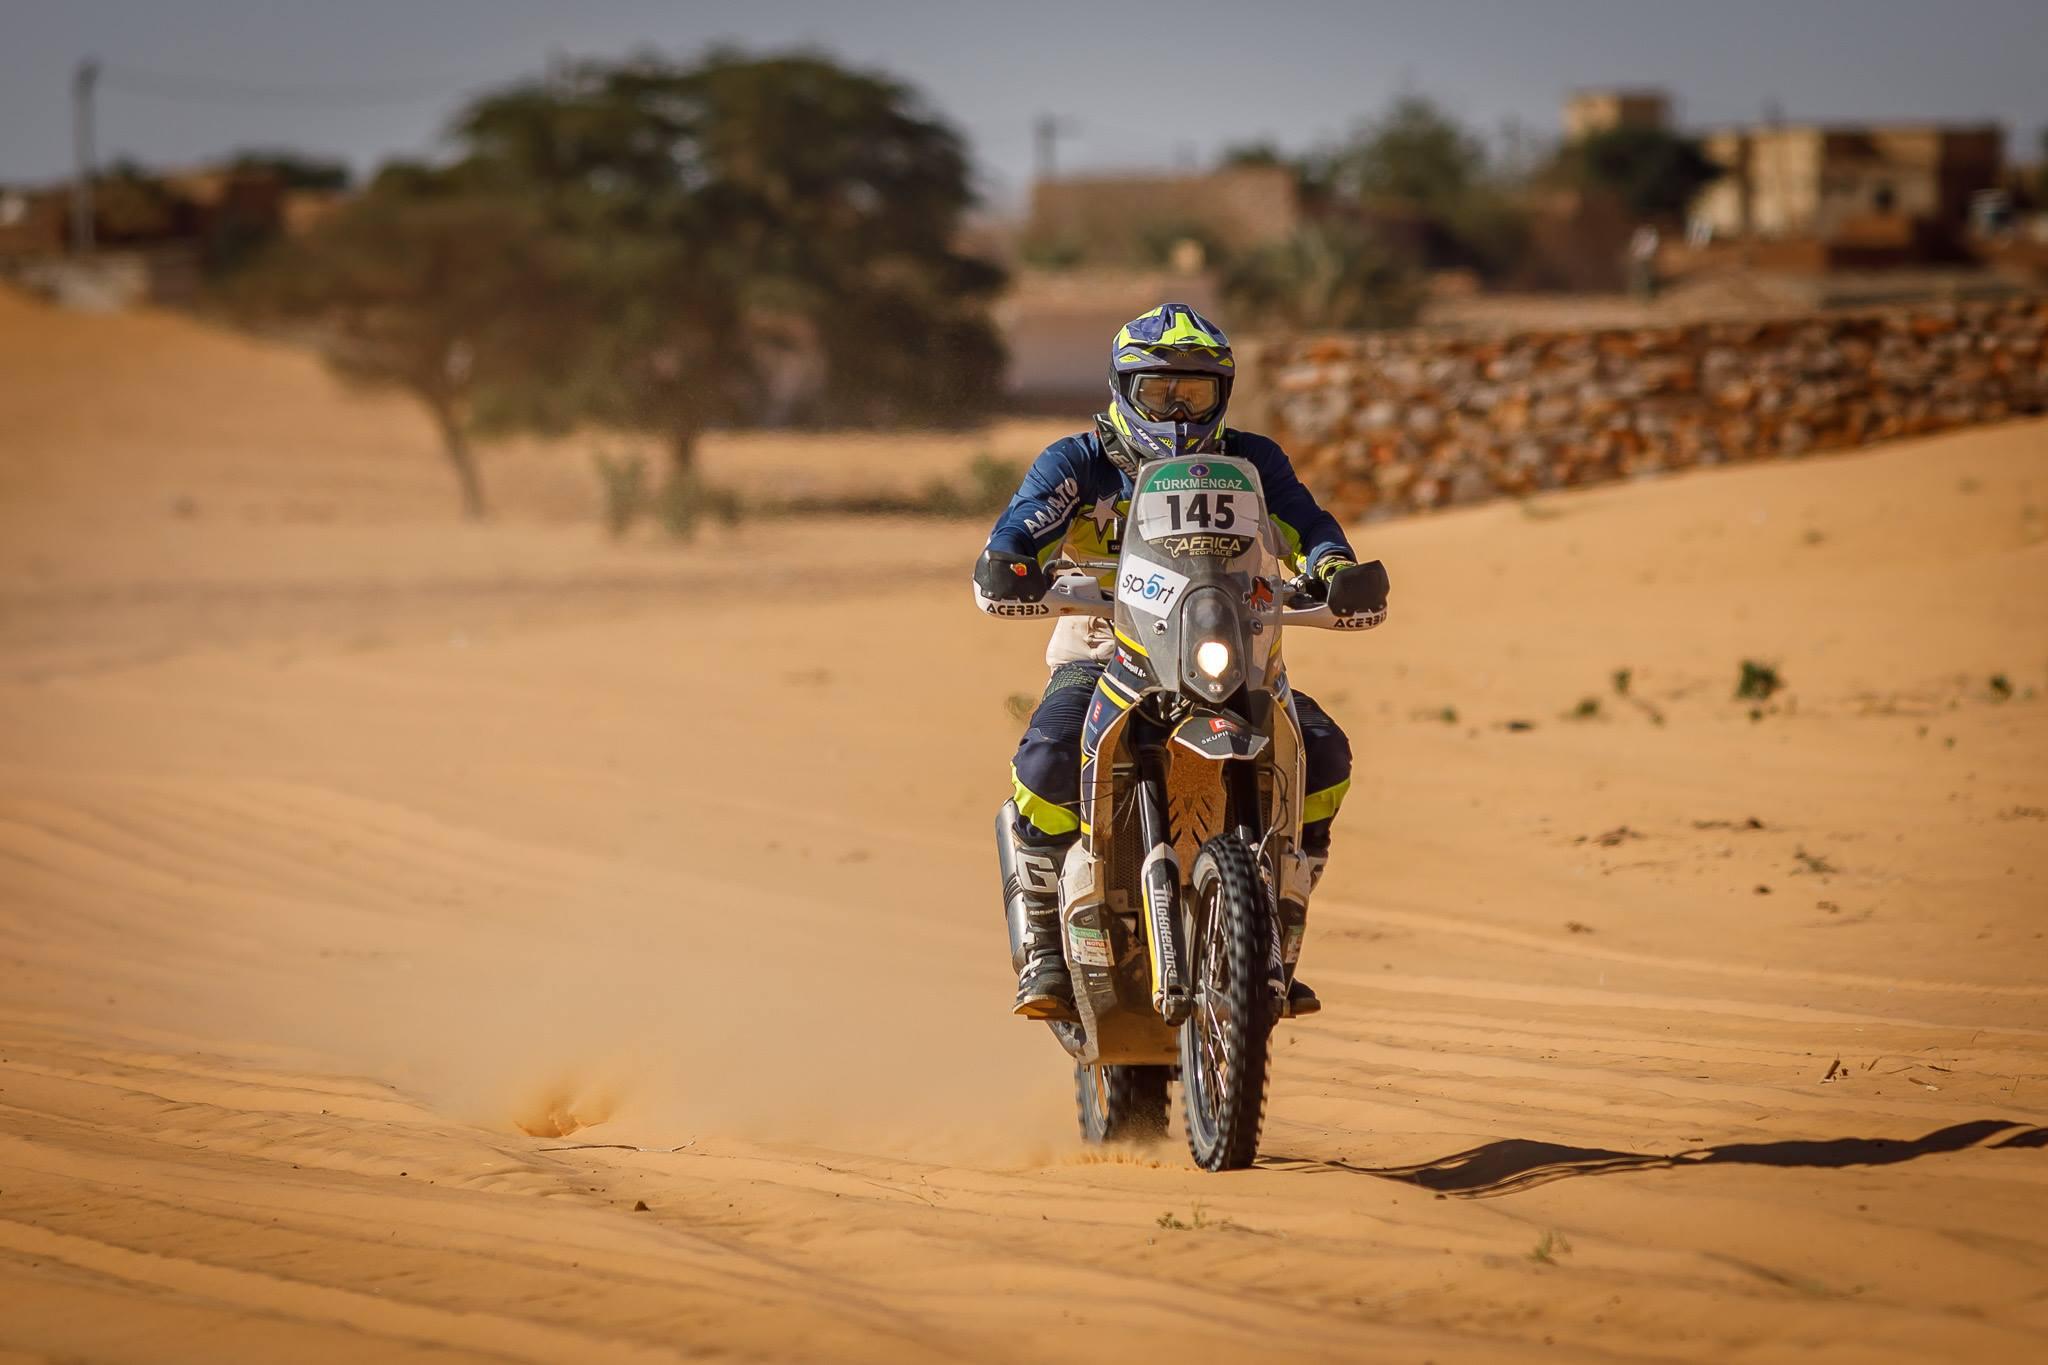 Lukášovi Kvapilovi přejeli motorku, i tak etapu dokončil